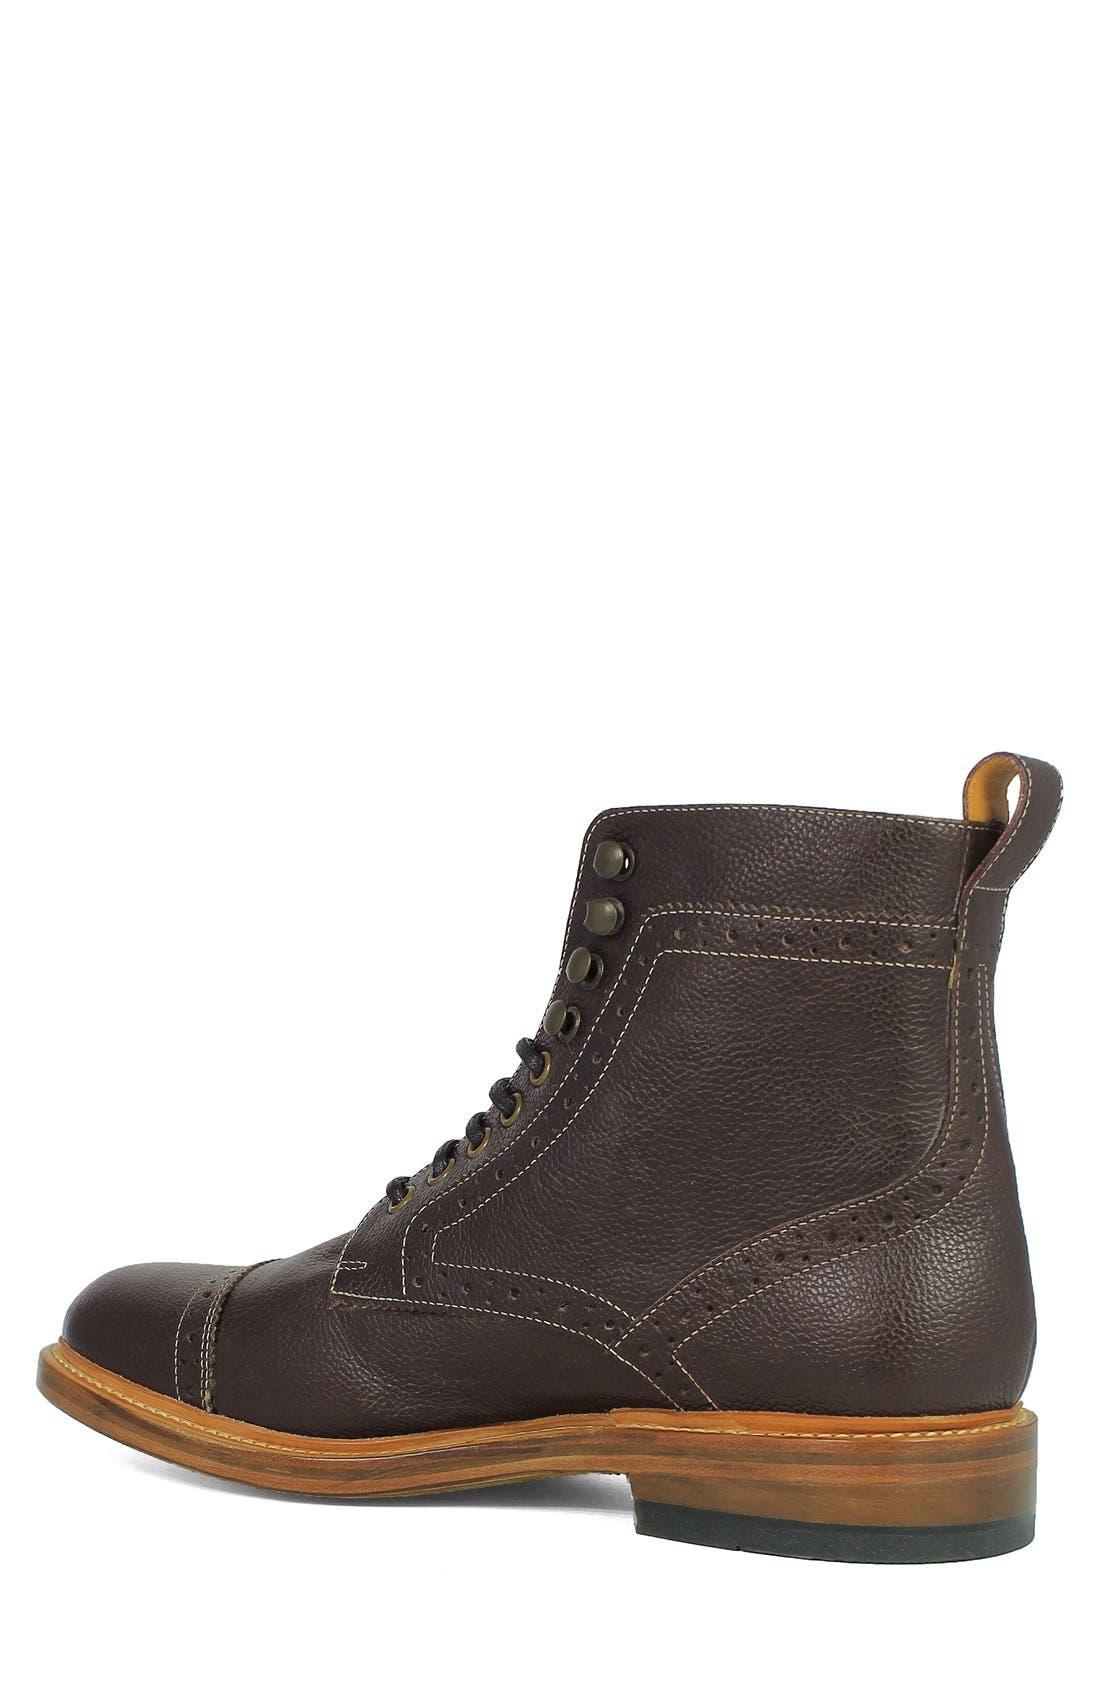 Madison II Cap Toe Boot,                             Alternate thumbnail 2, color,                             930